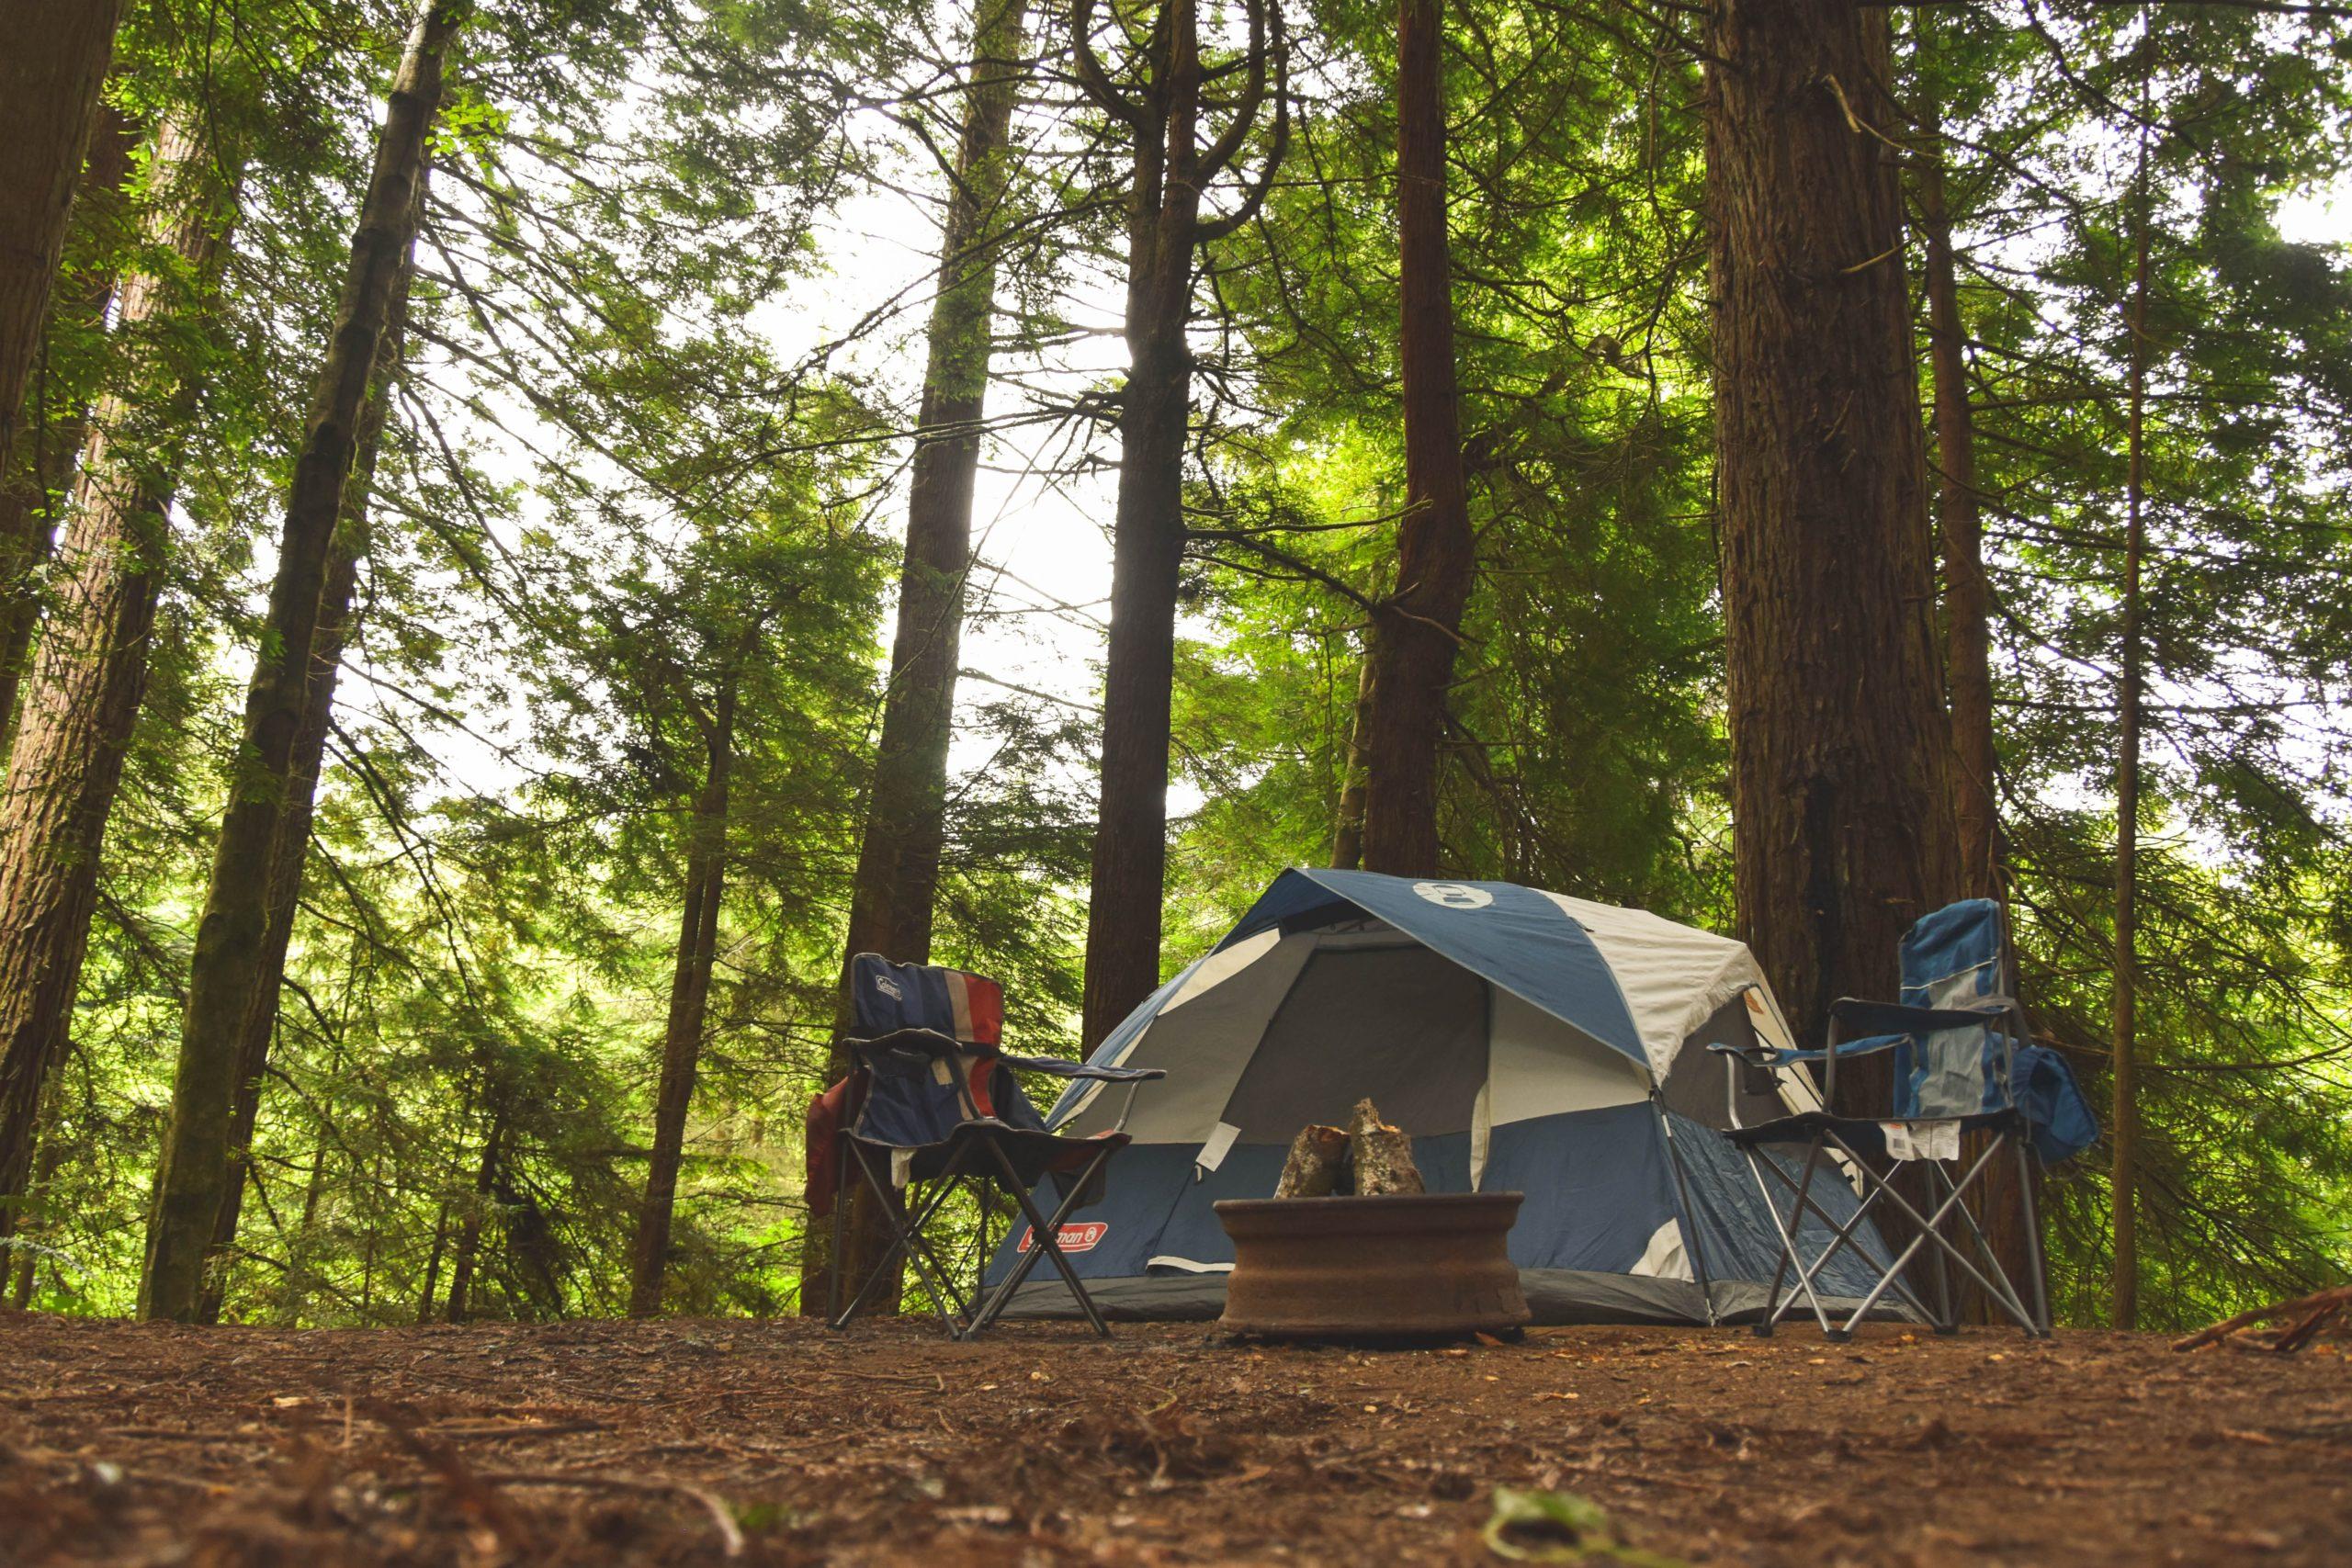 Dirt Bike Camping Gear - Ultimate Motorcycle Camping Guide